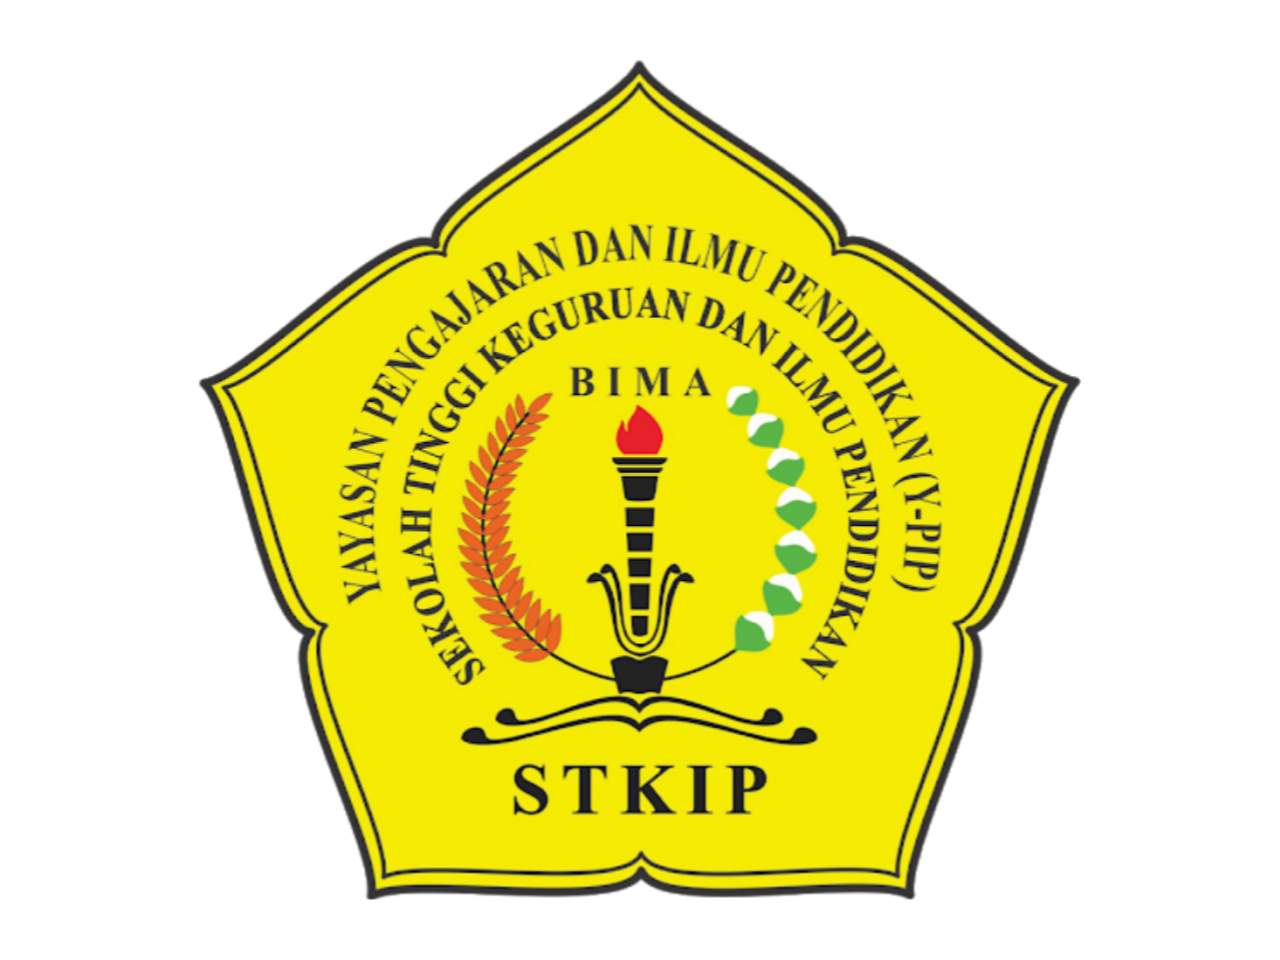 Logo STKIP Bima Format PNG